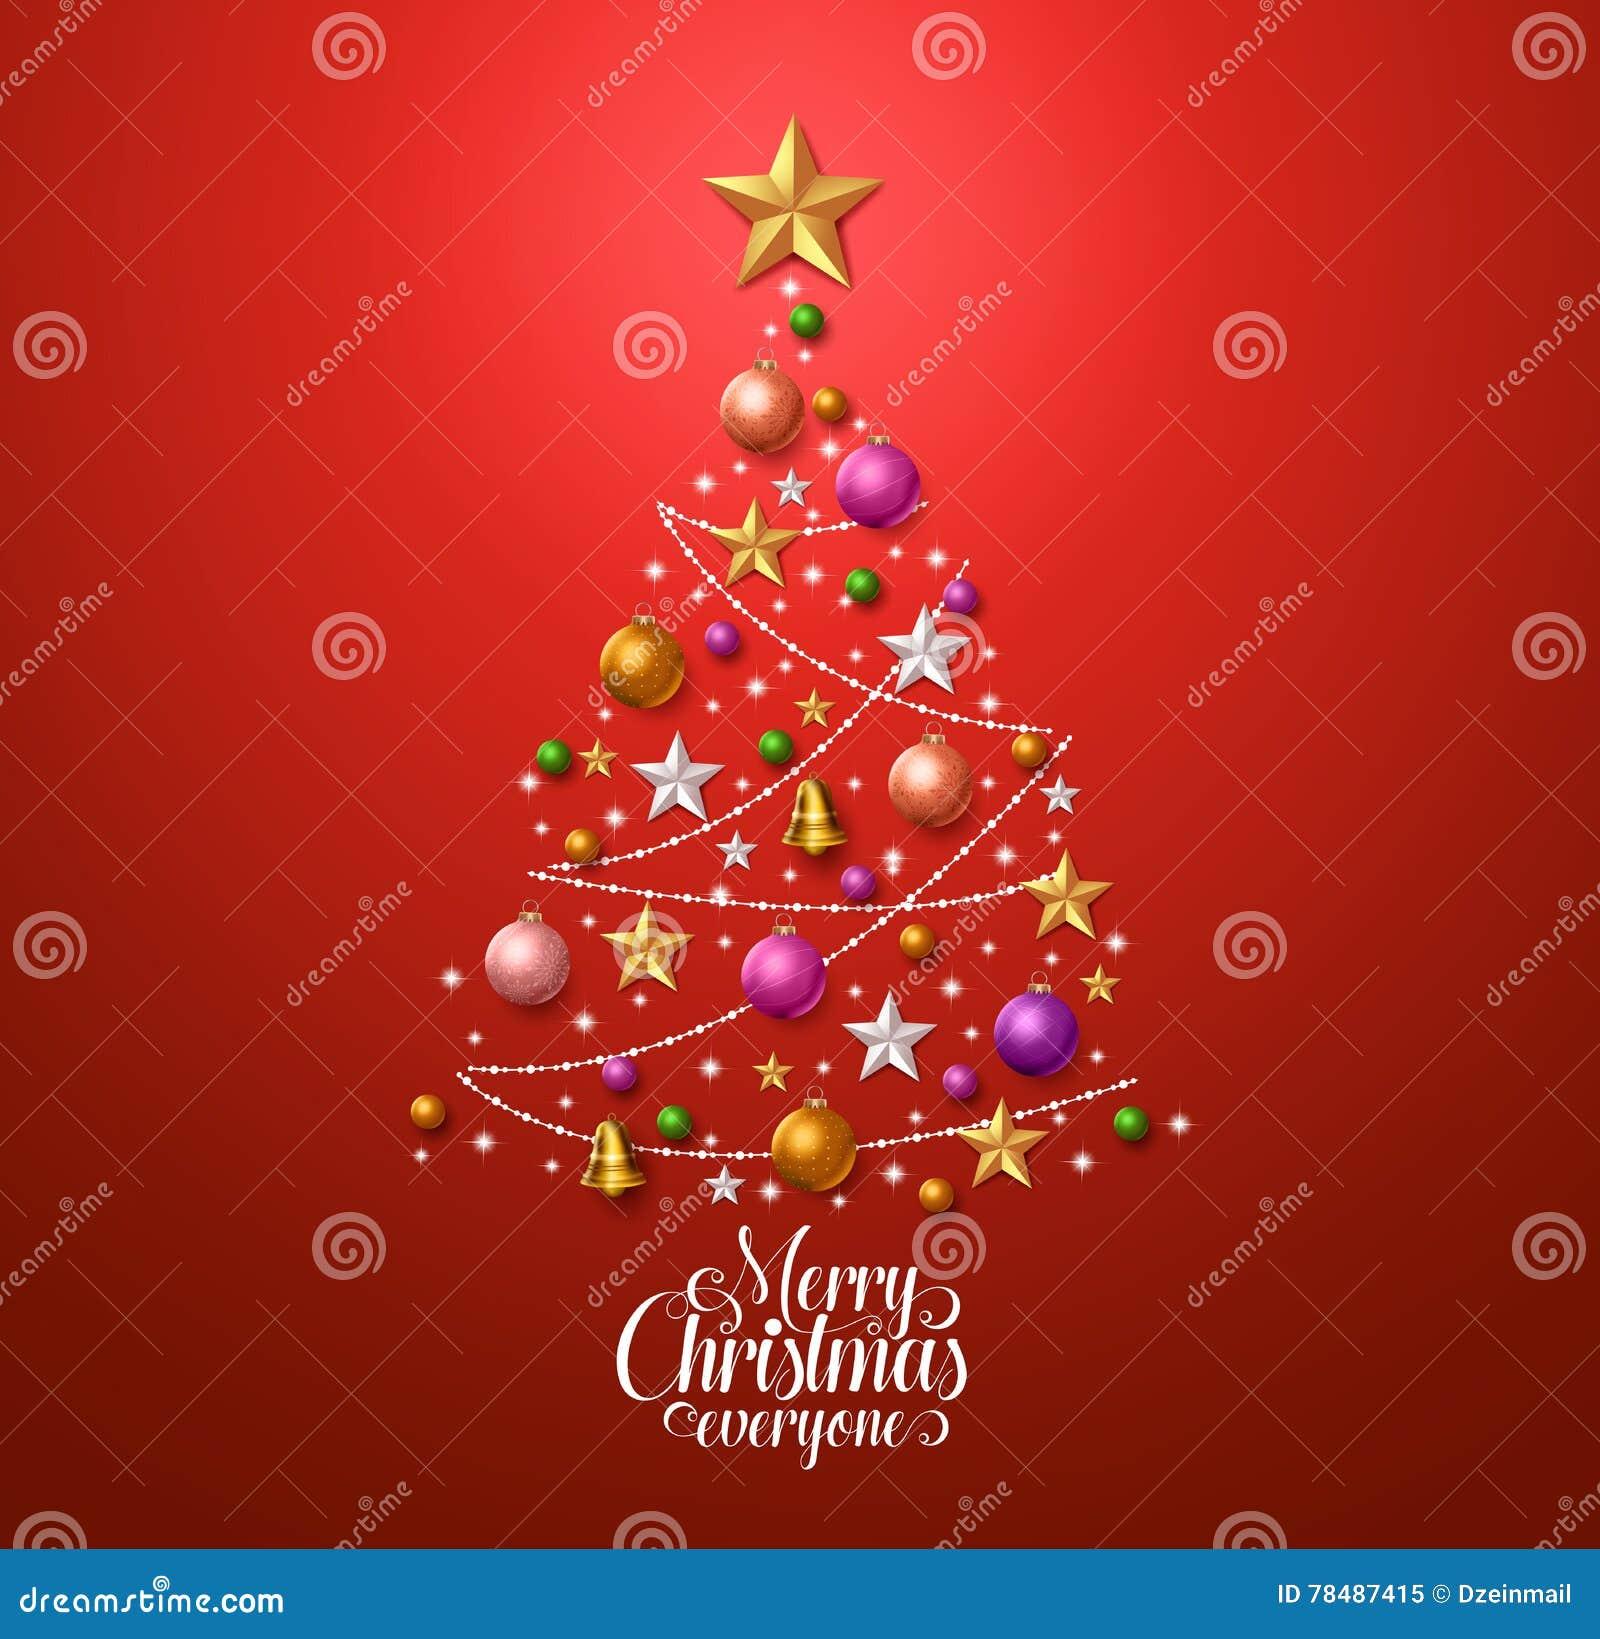 Dise o del rbol de navidad para la tarjeta de - Arboles de navidad de diseno ...